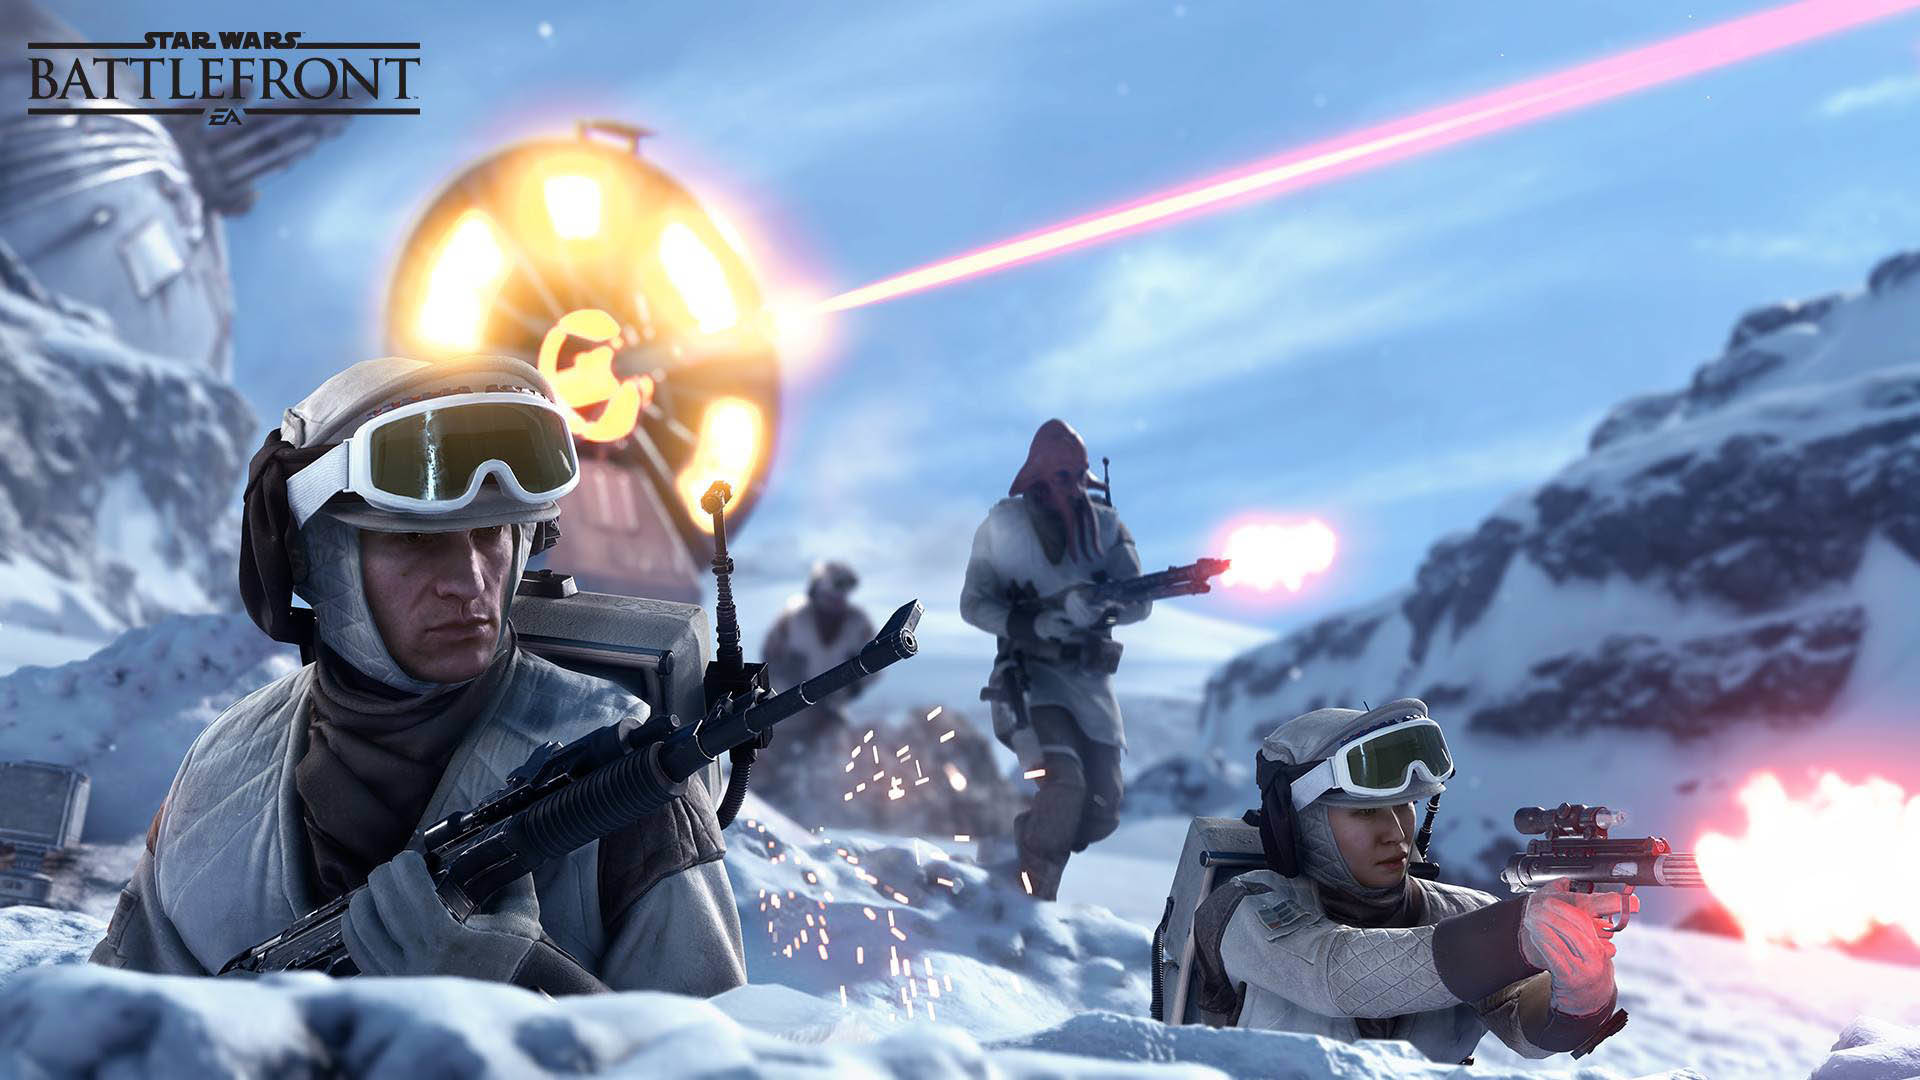 Rebel Soldiers defending – Star Wars Battlefront wallpaper